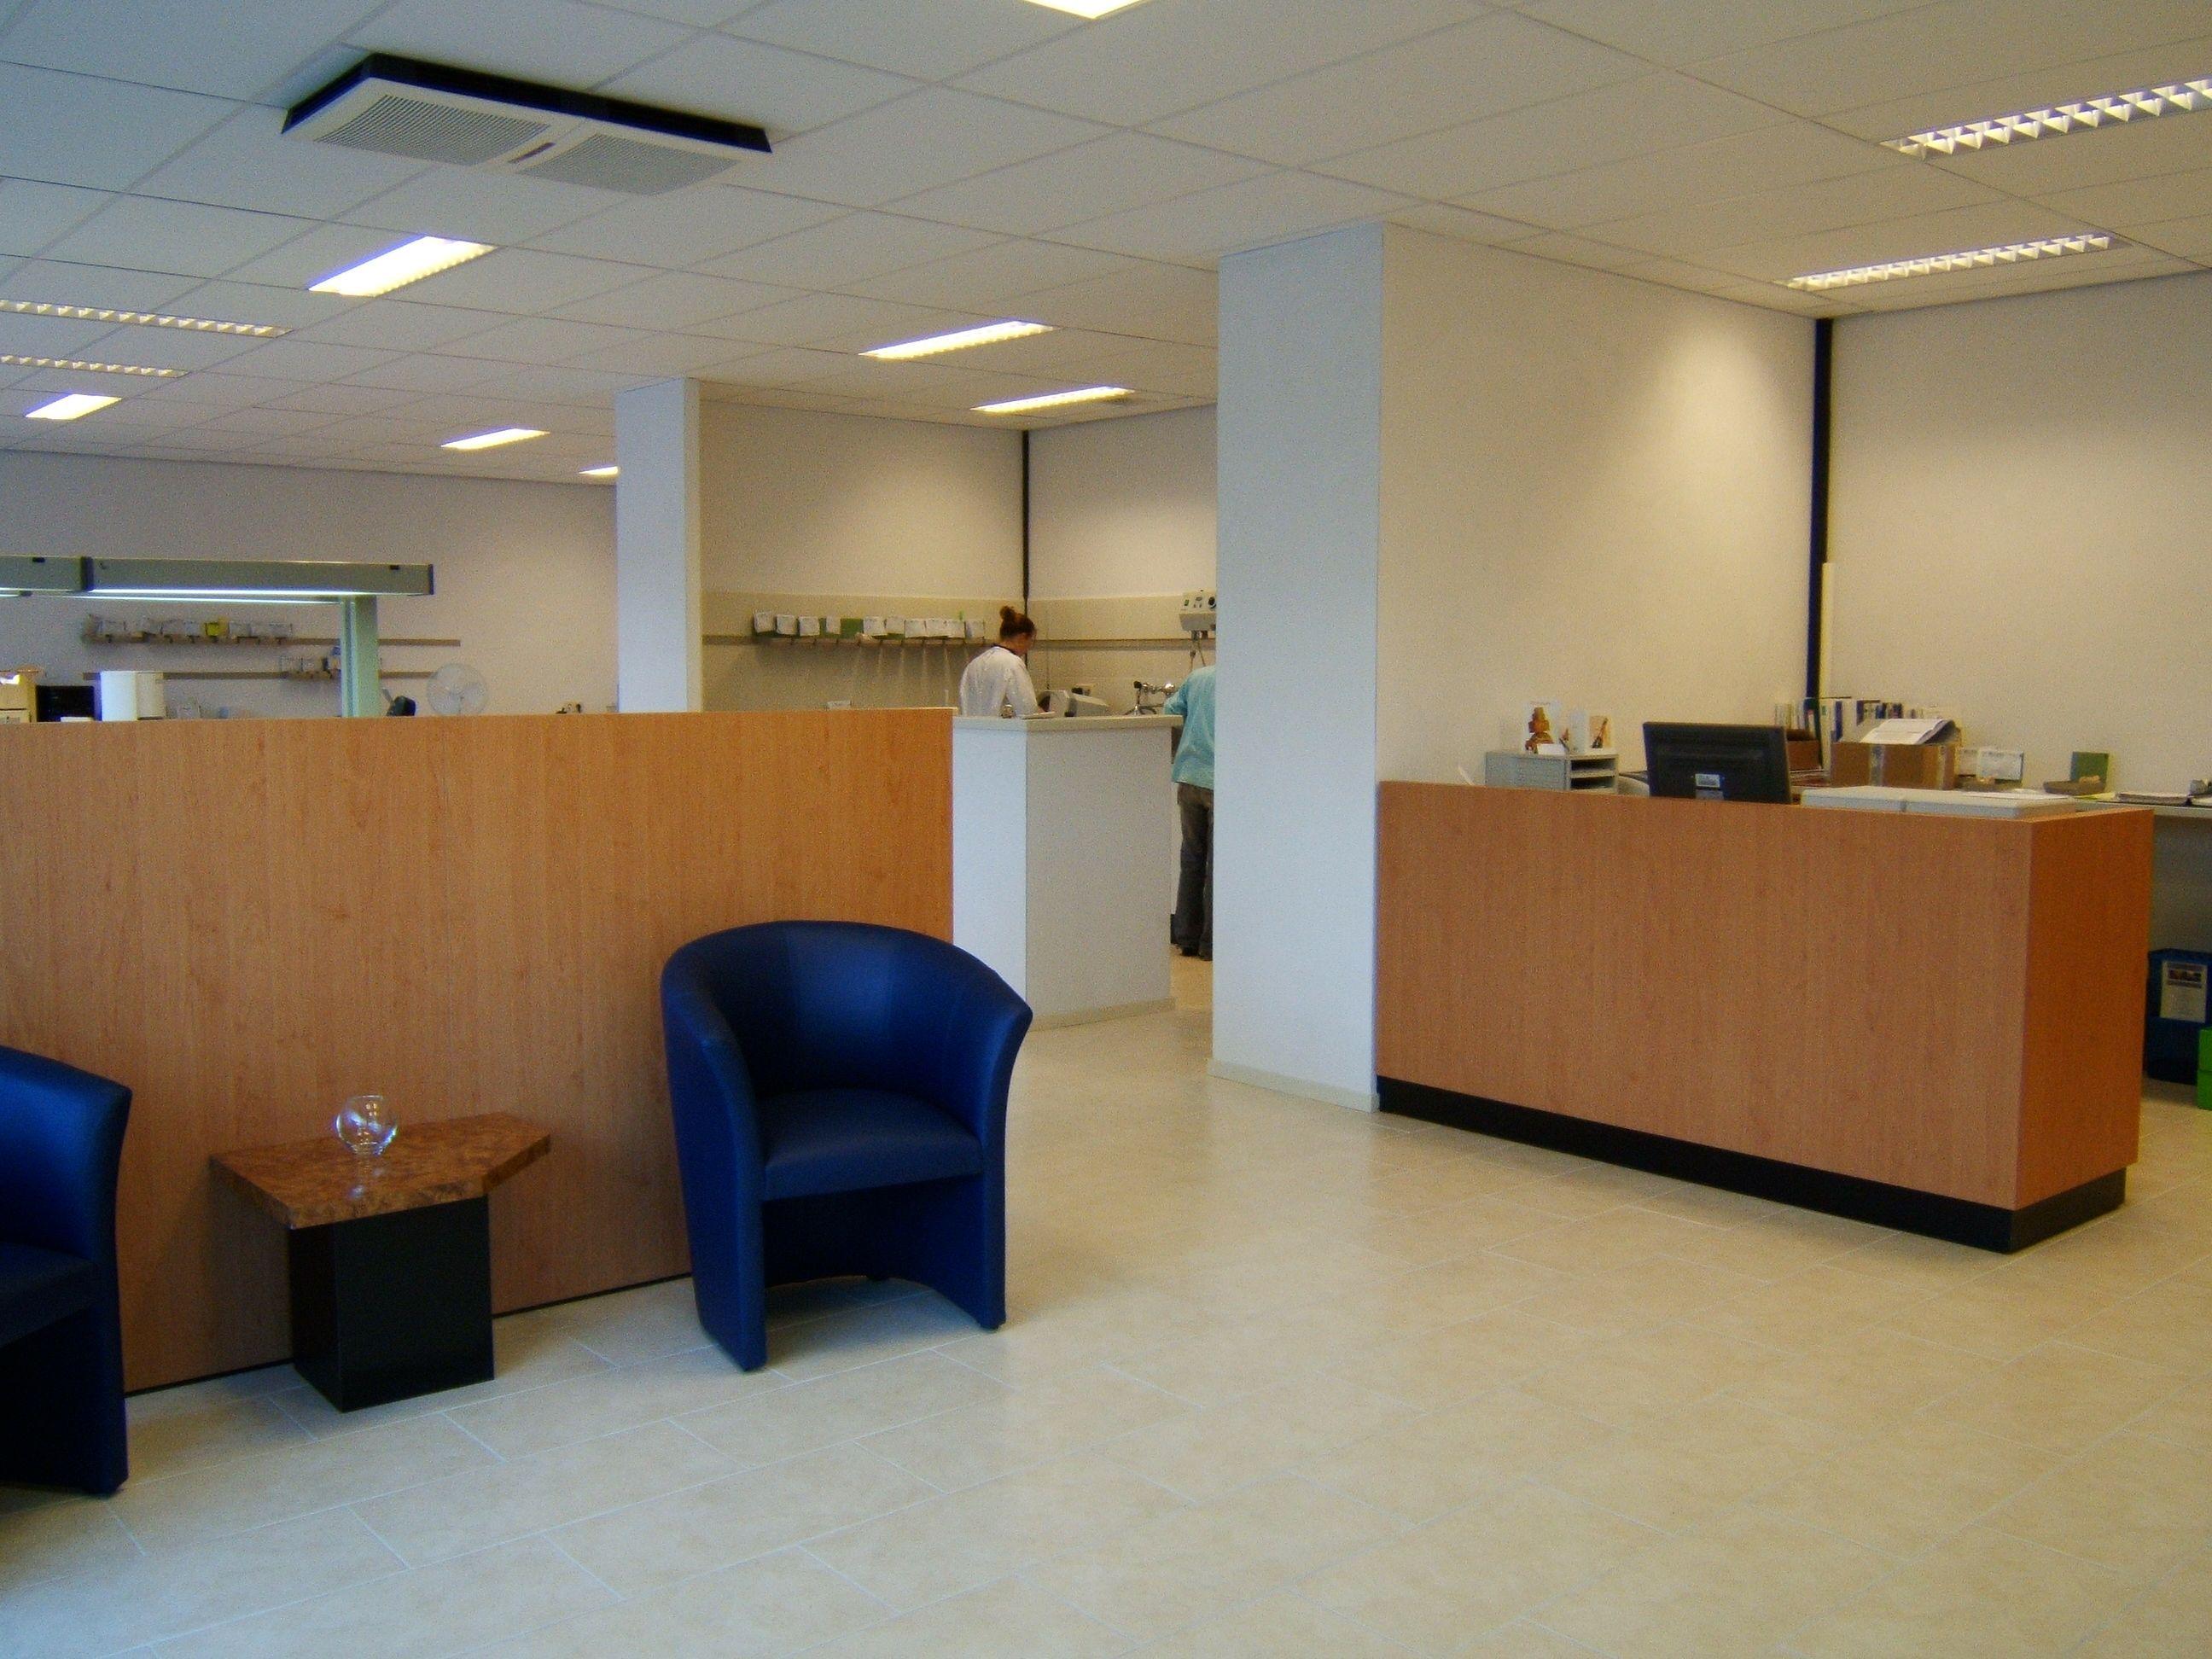 Layout Dental Lab Sint Oedenrode, The Netherlands